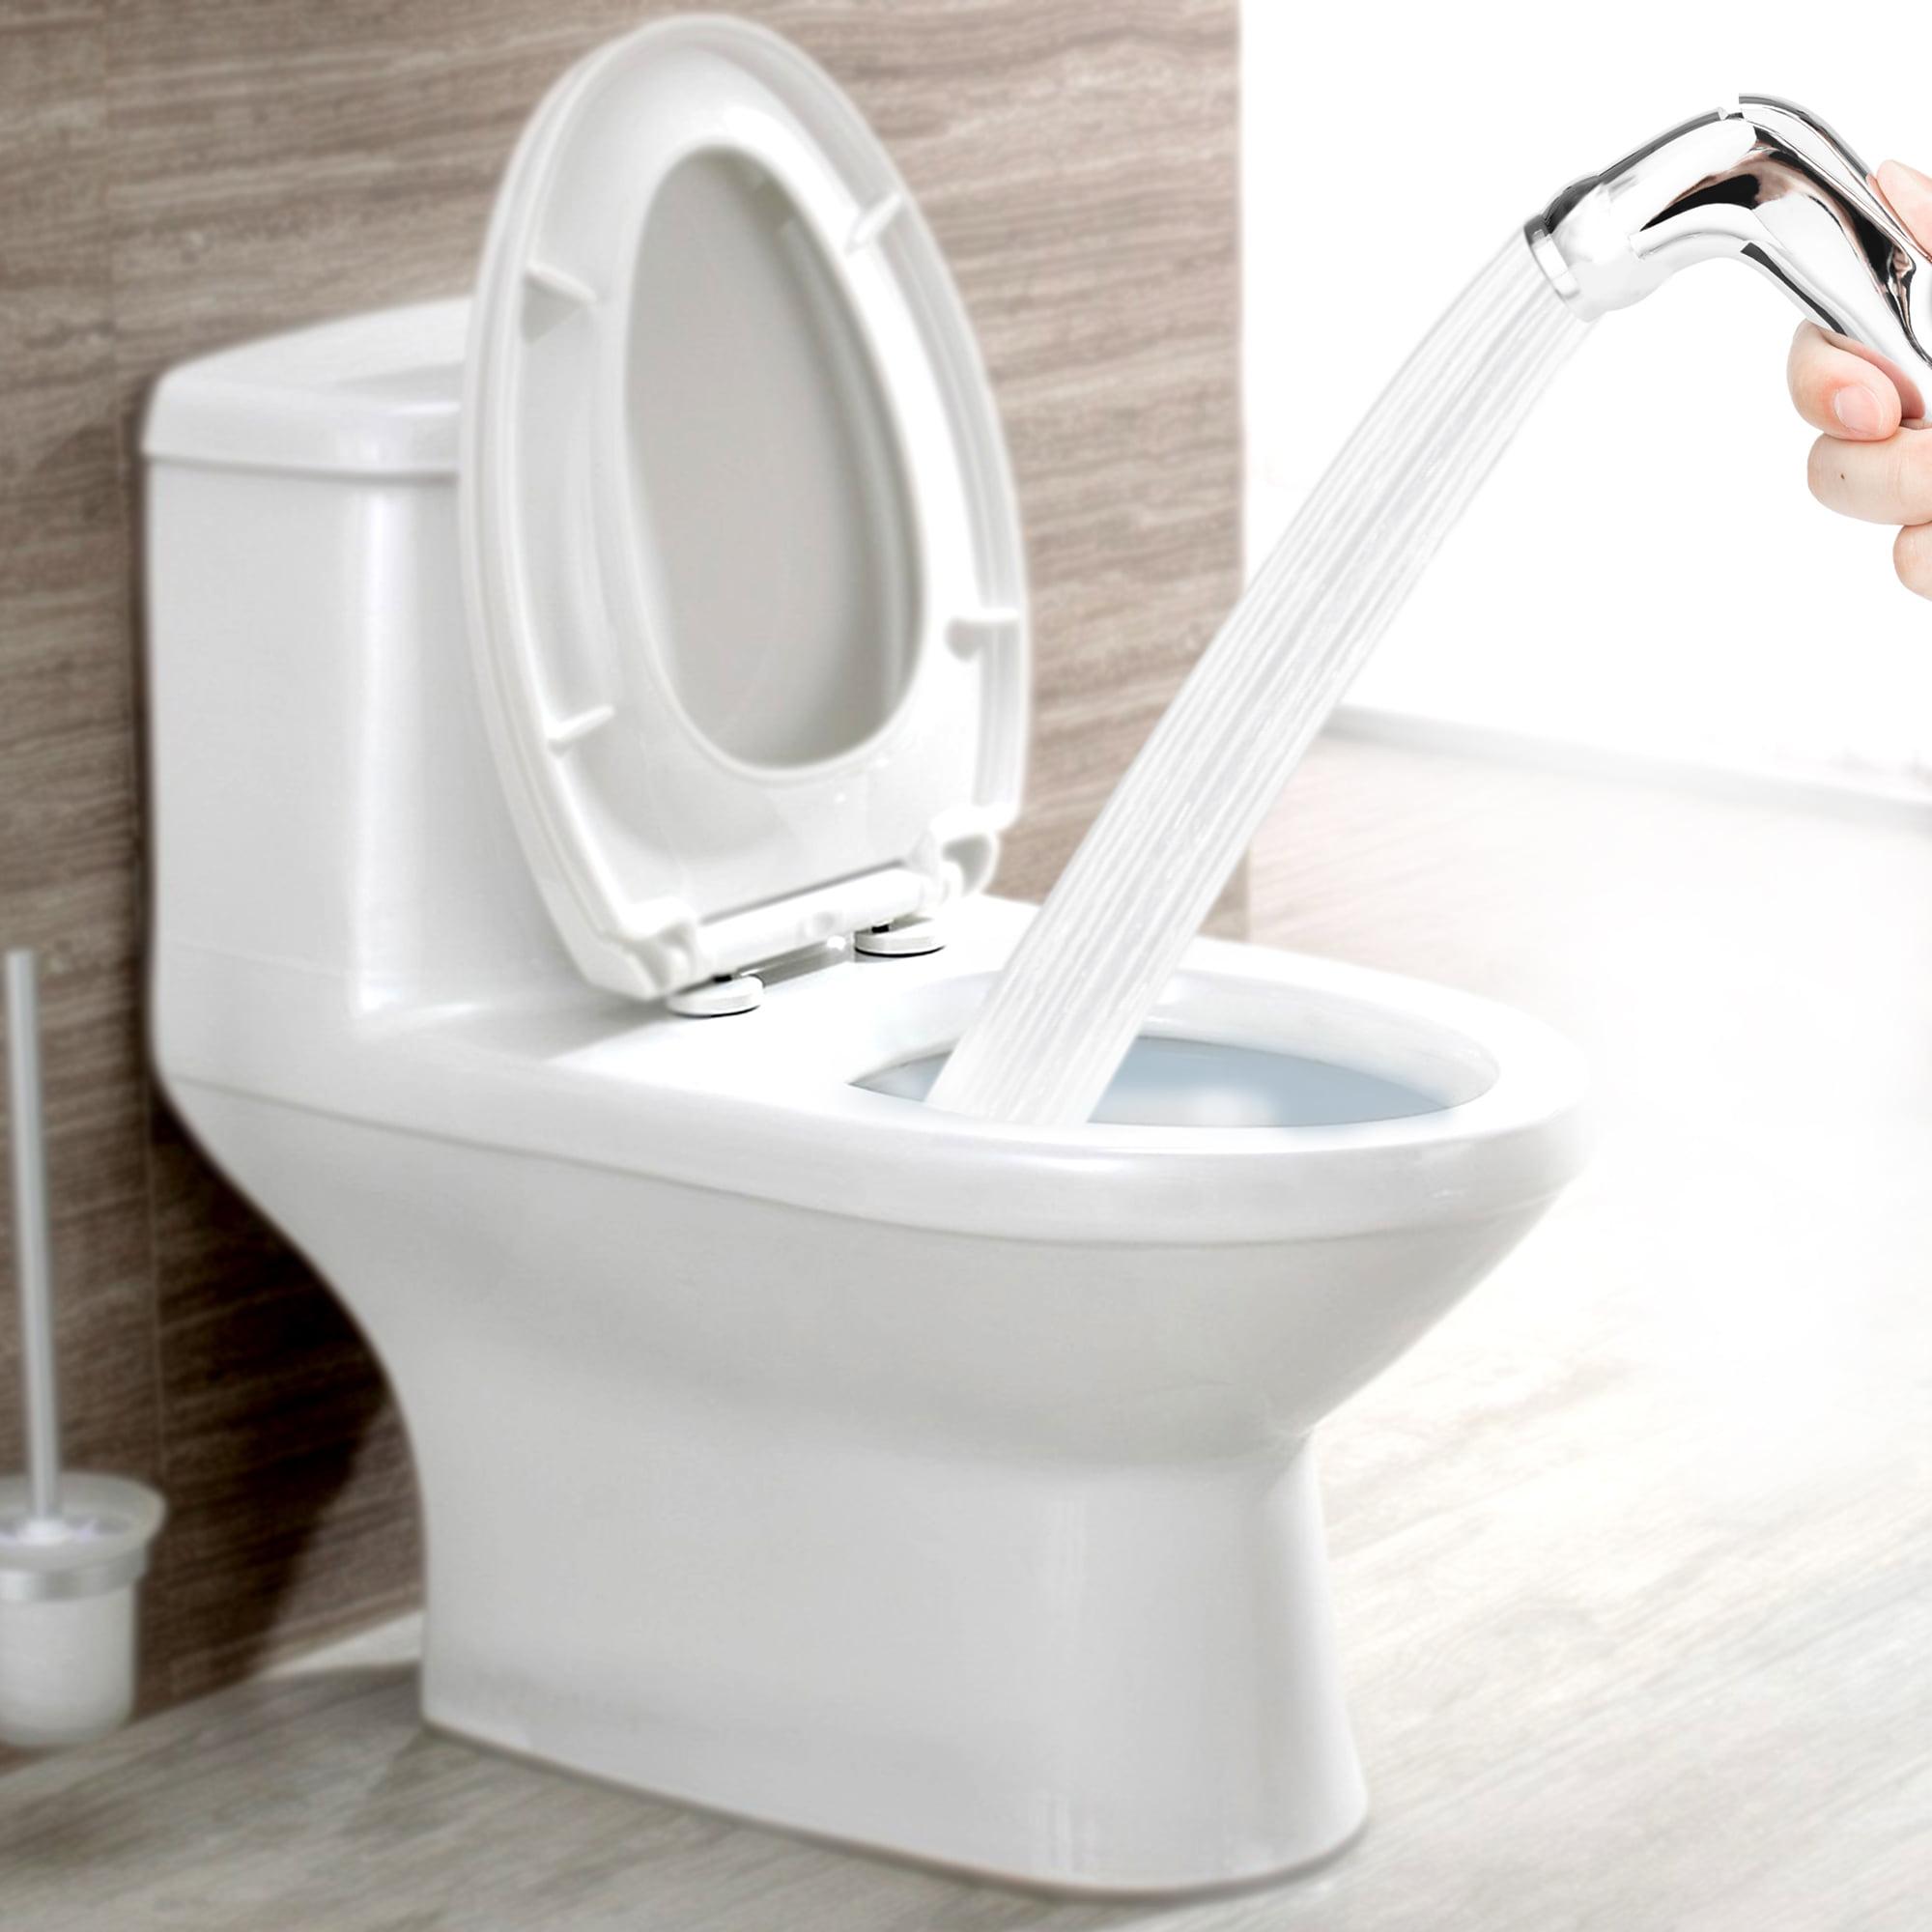 Handheld Bidet Sprayer For Toilet Seat With Anti Leaking Hose Toilet Or Wall Mounted Multi Function Bathroom Spray Gun Walmart Com Walmart Com